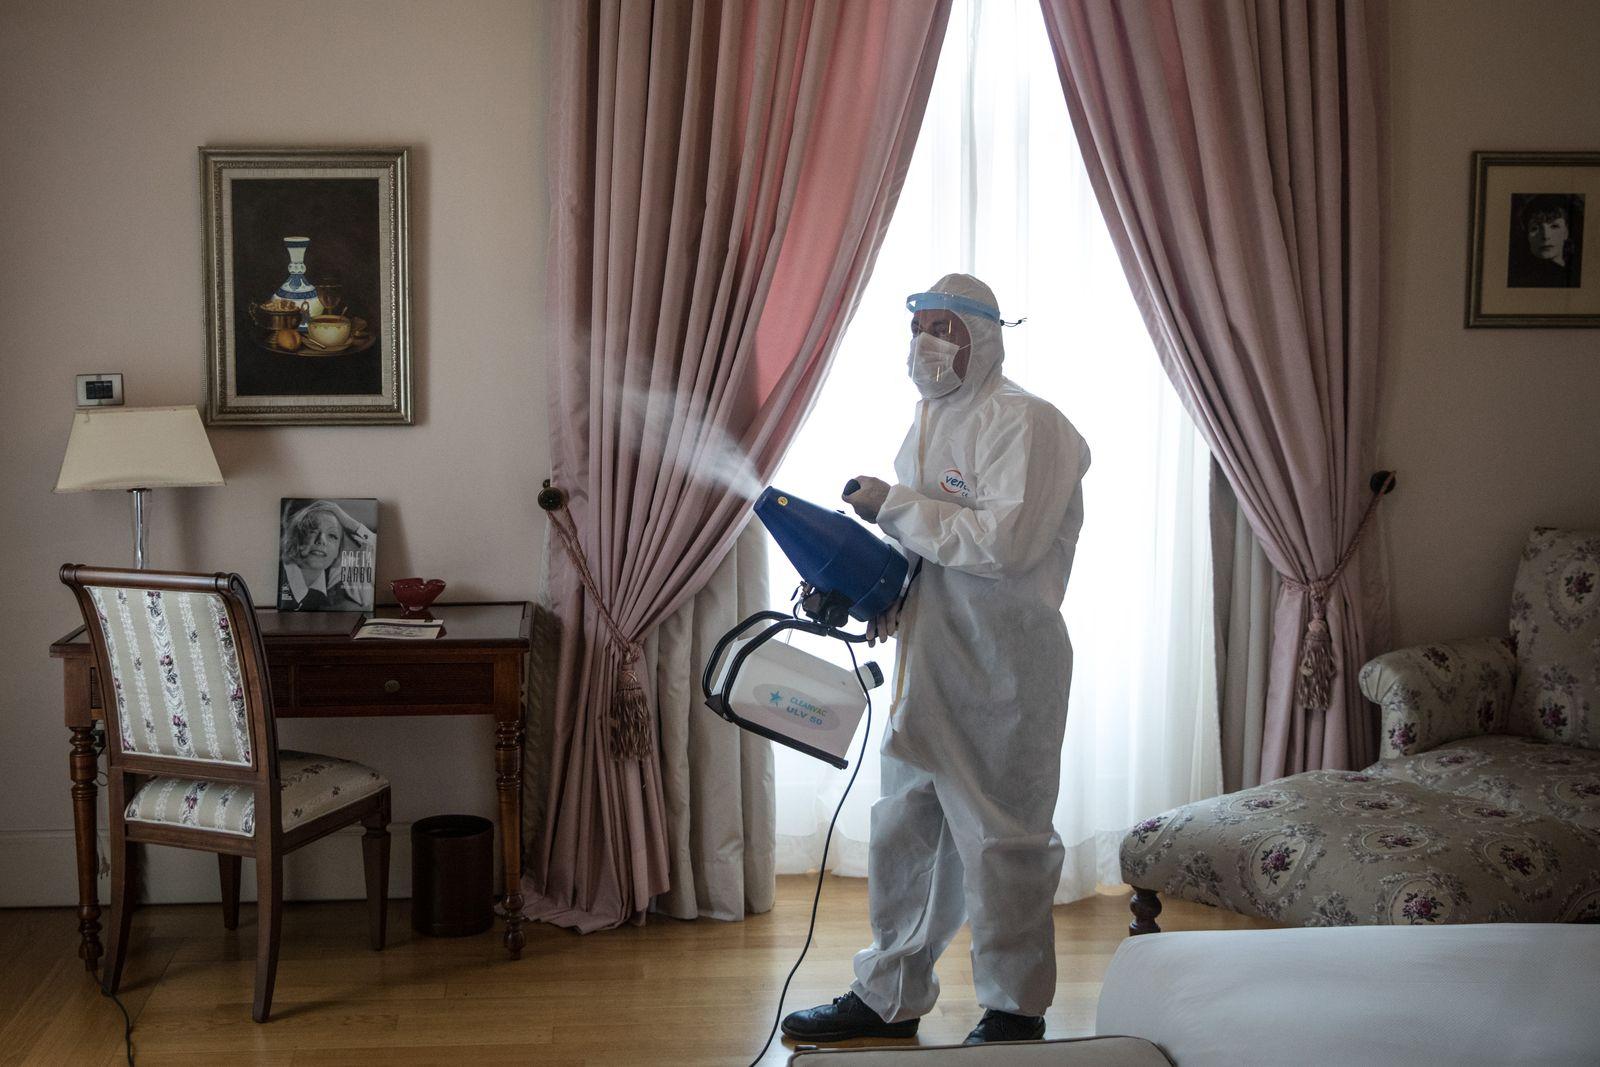 Istanbuls Historic Pera Palace Hotel Reopens Under New Coronavirus Restrictions